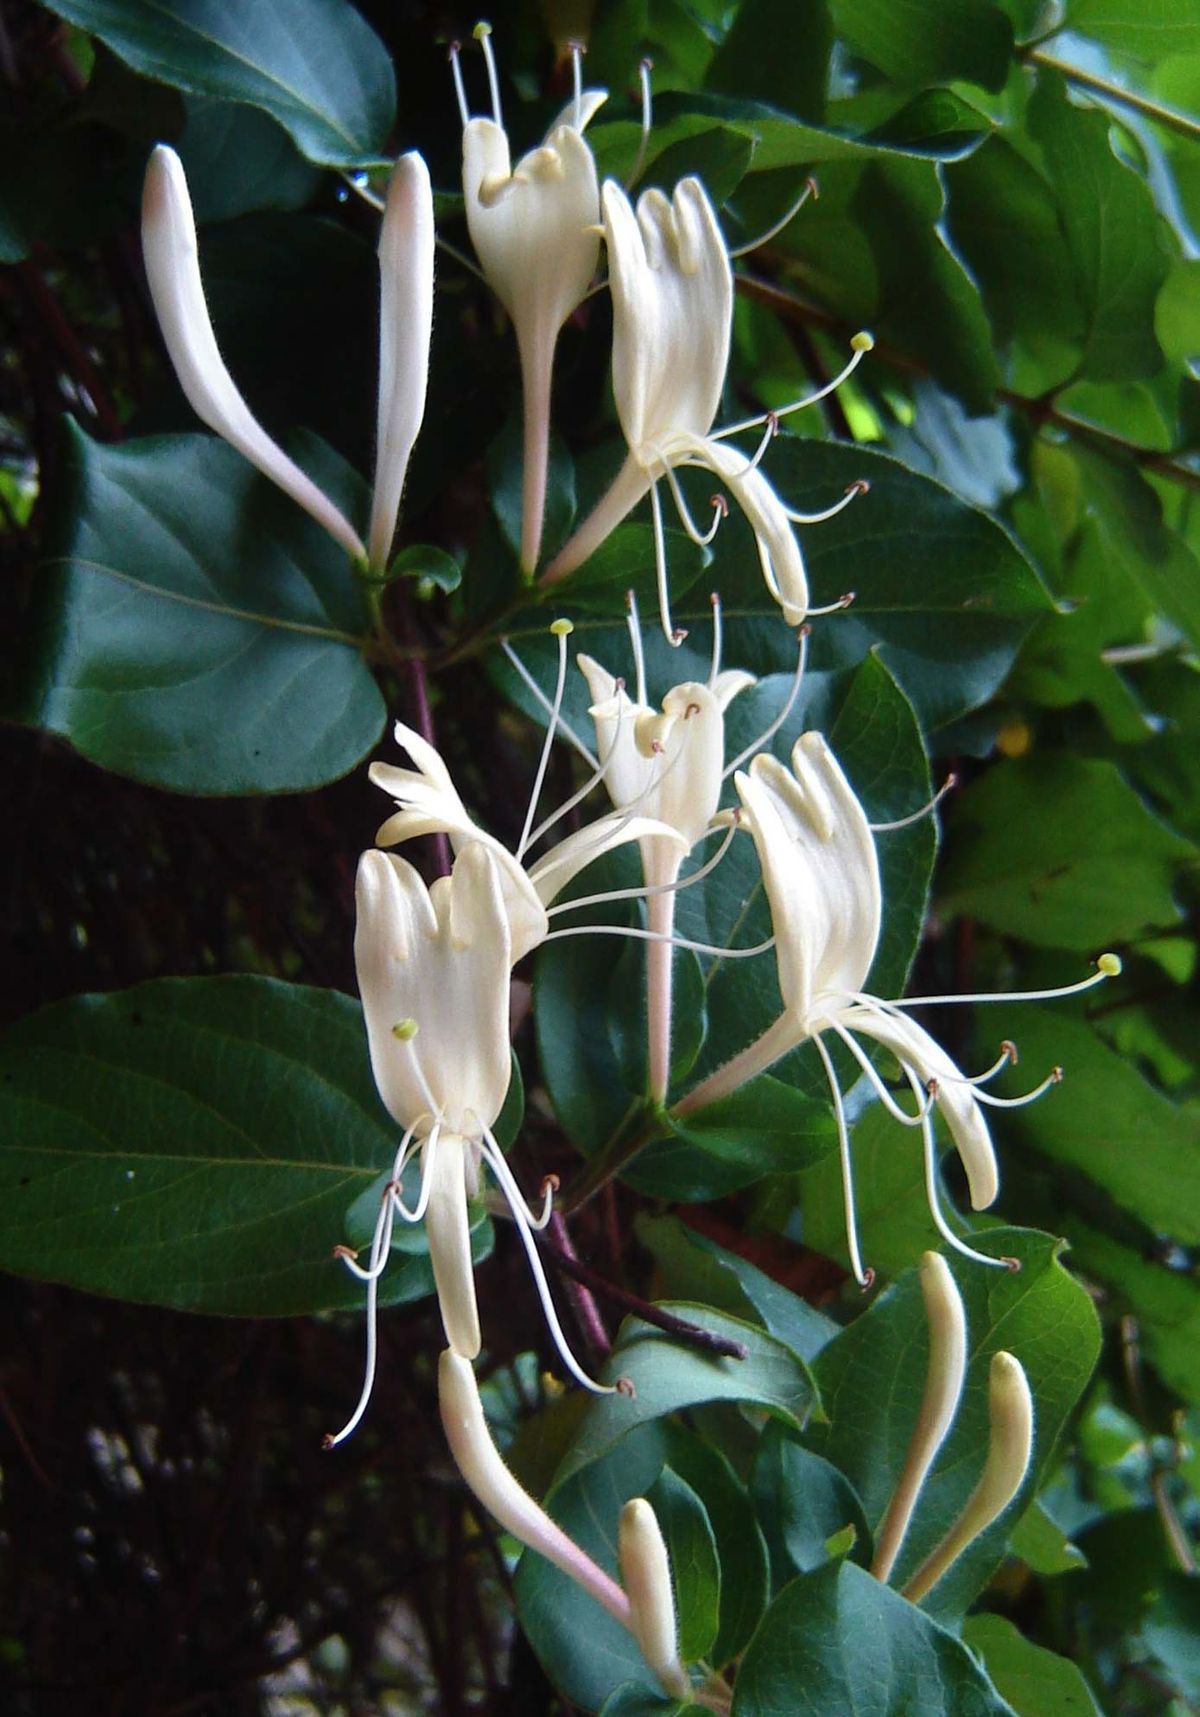 Lonicera Japonica Wikipedia Fleurs Plante Medicinale Vegetal